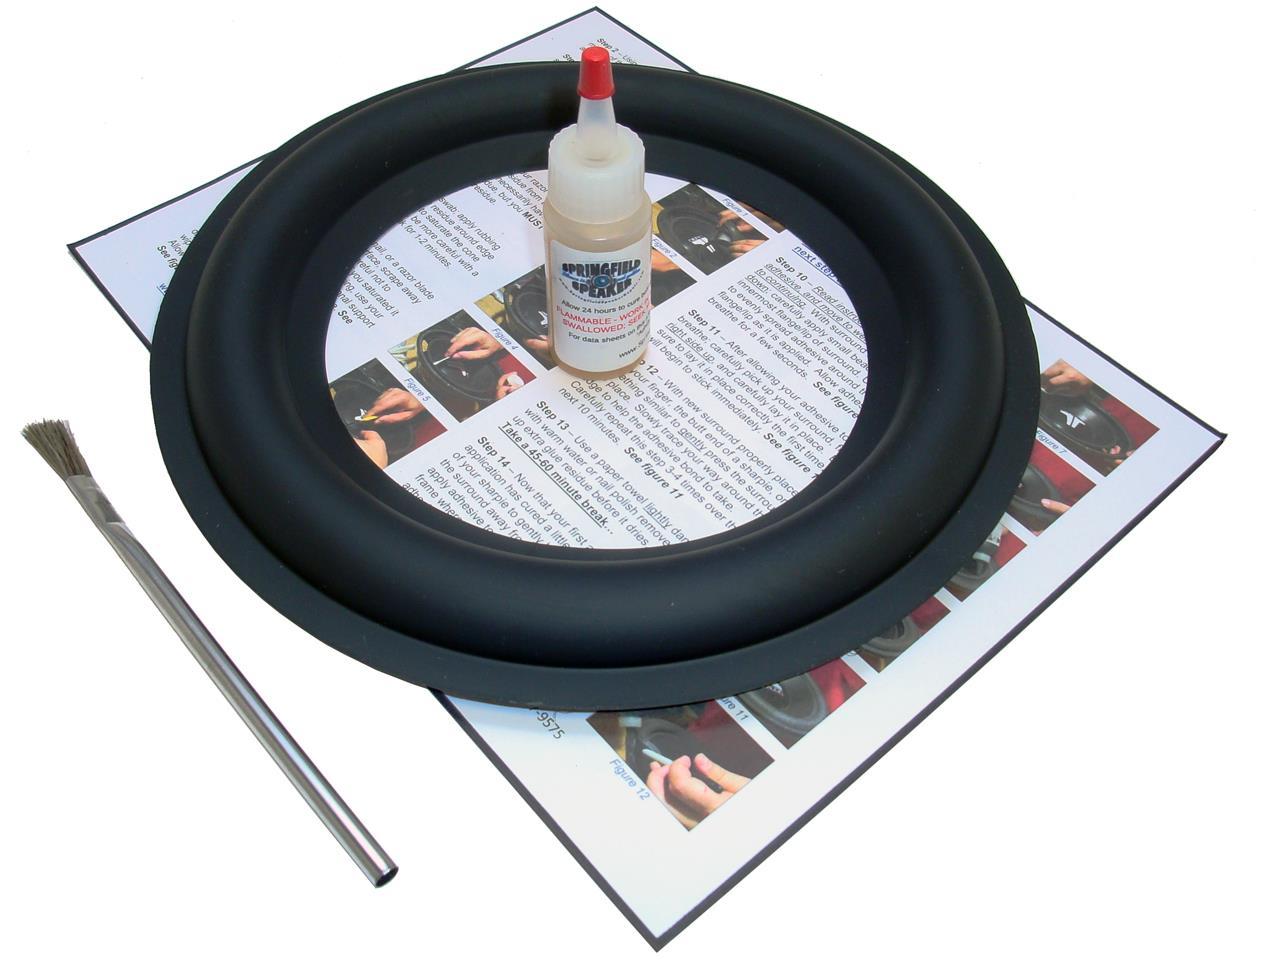 10 Rockford Fosgate Hx2 Punch Subwoofer Rubber Surround Repair Kit 12